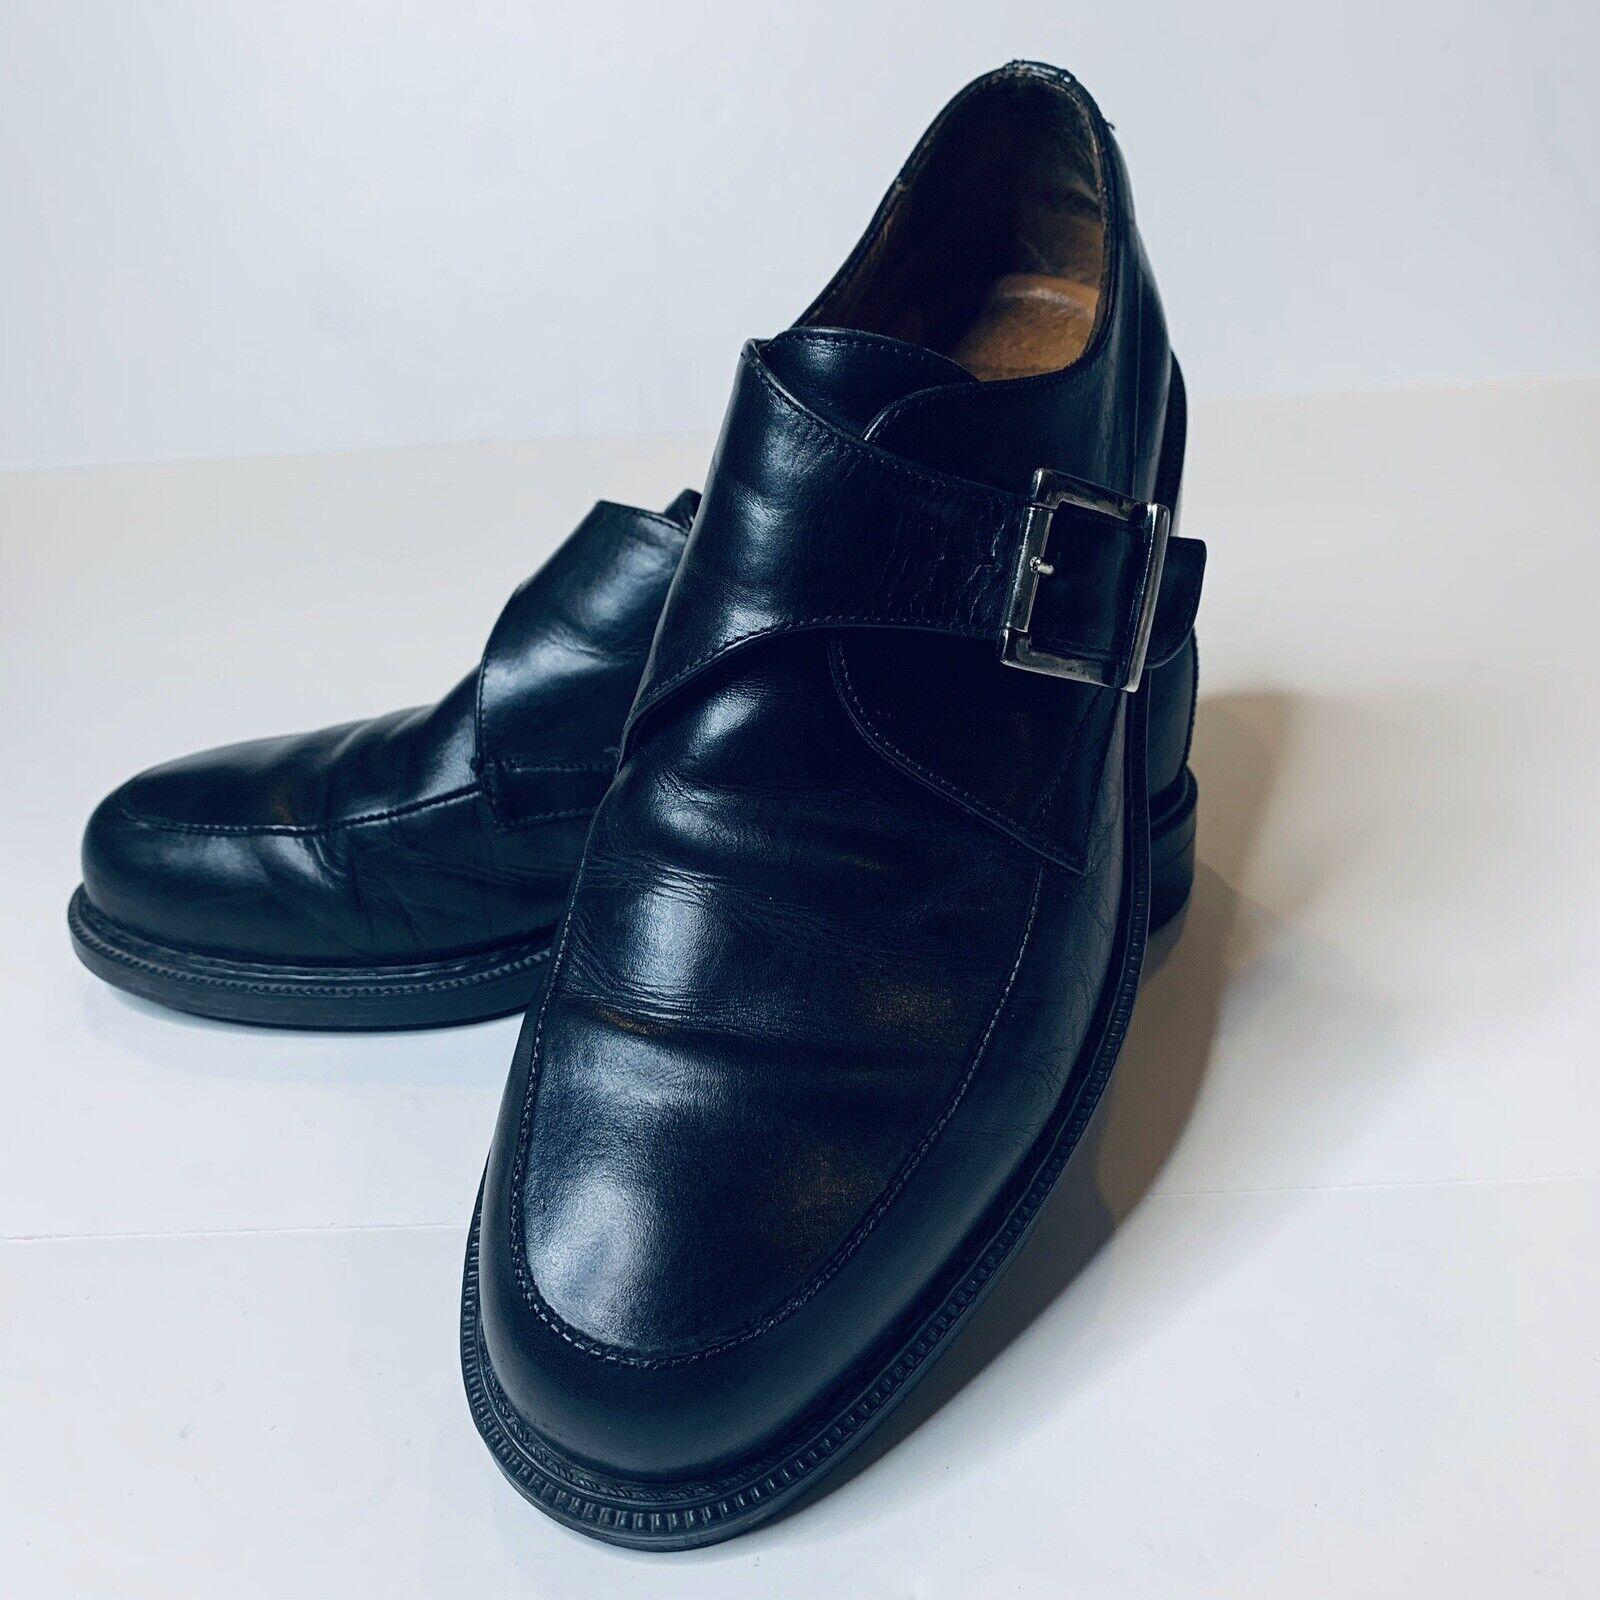 Johnston & Murphy Mens Shoes Monk Strap Loafer 10.5 M Black Leather